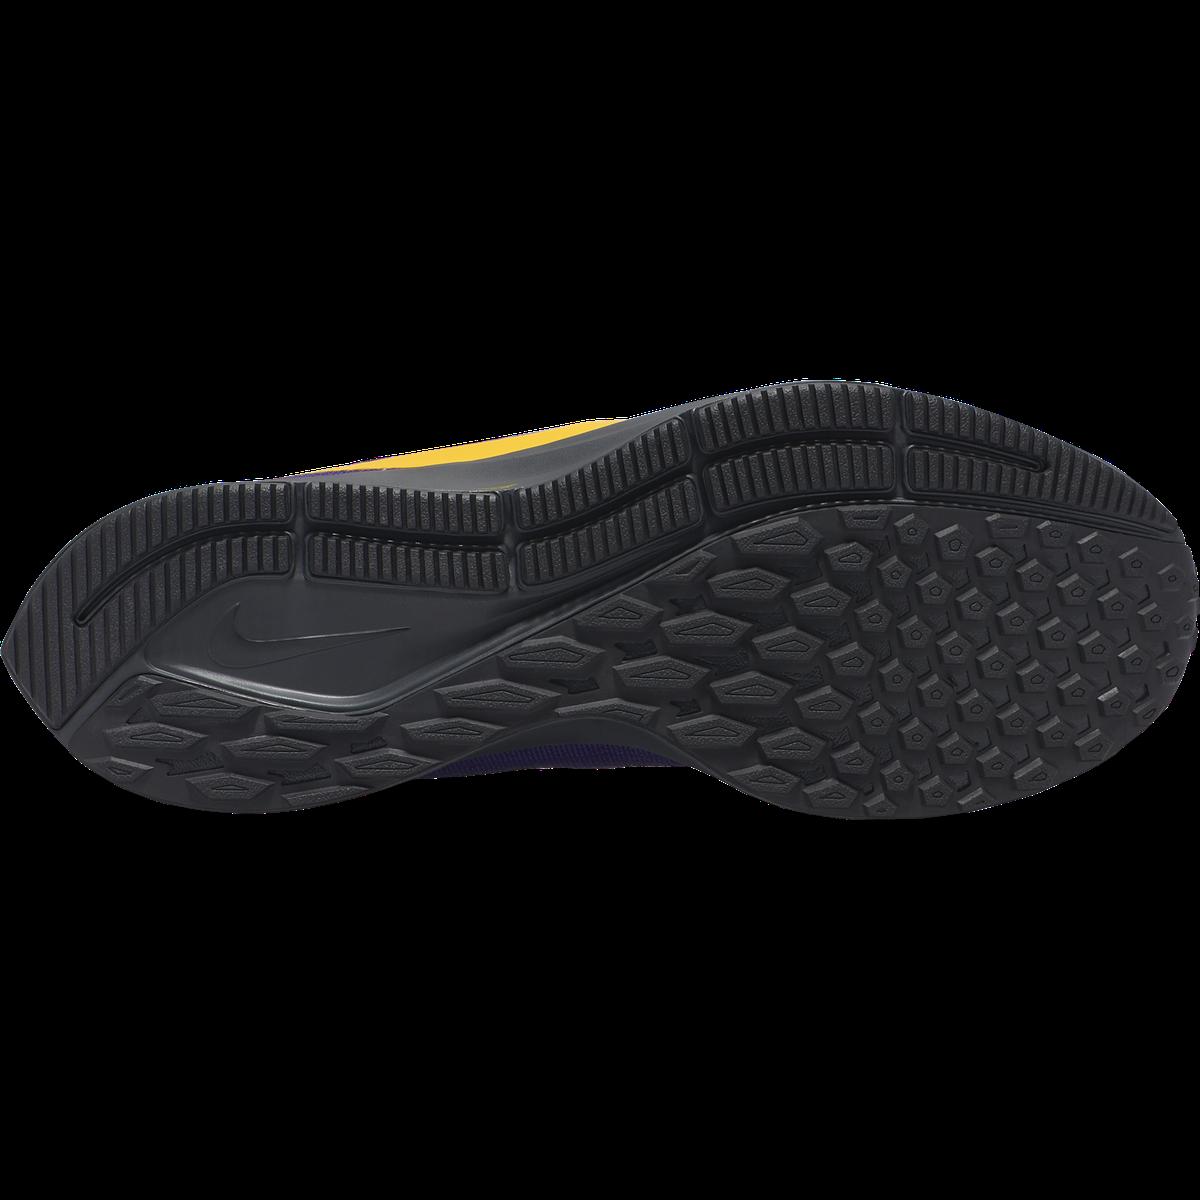 Nike drops the new Air Zoom Pegasus 36 Minnesota Vikings